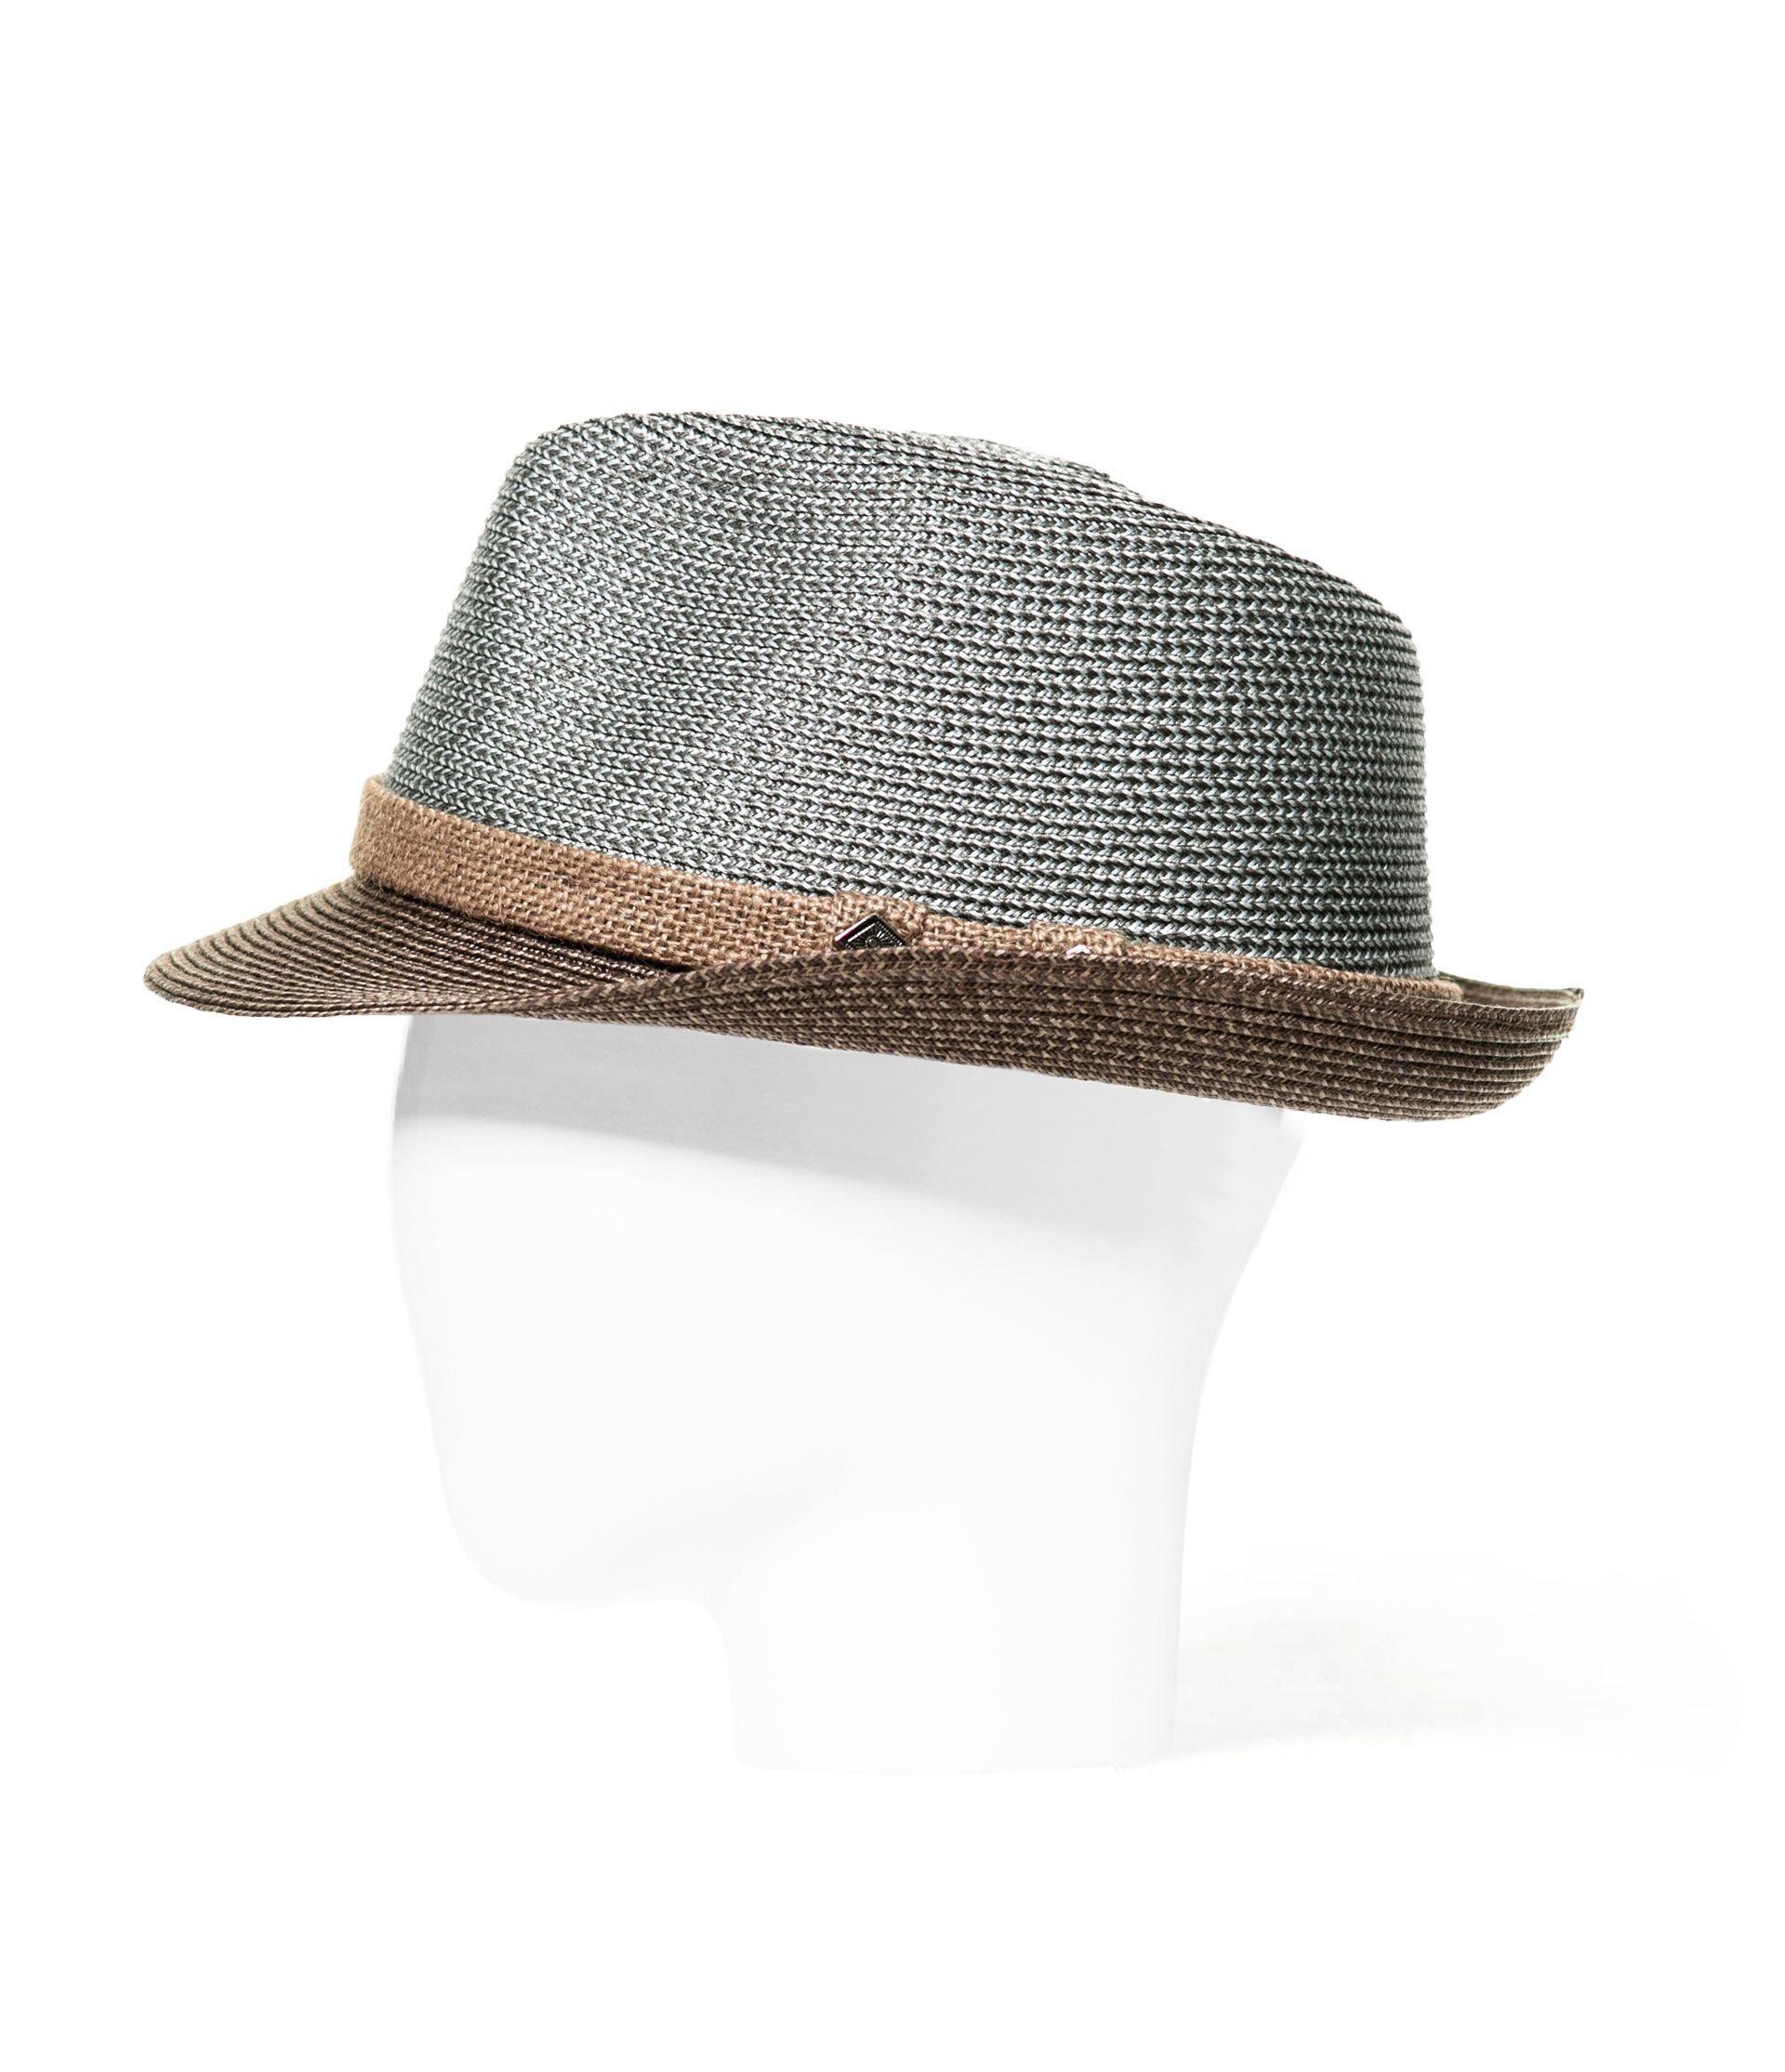 Search Engine Mens Accessories Zara Hats